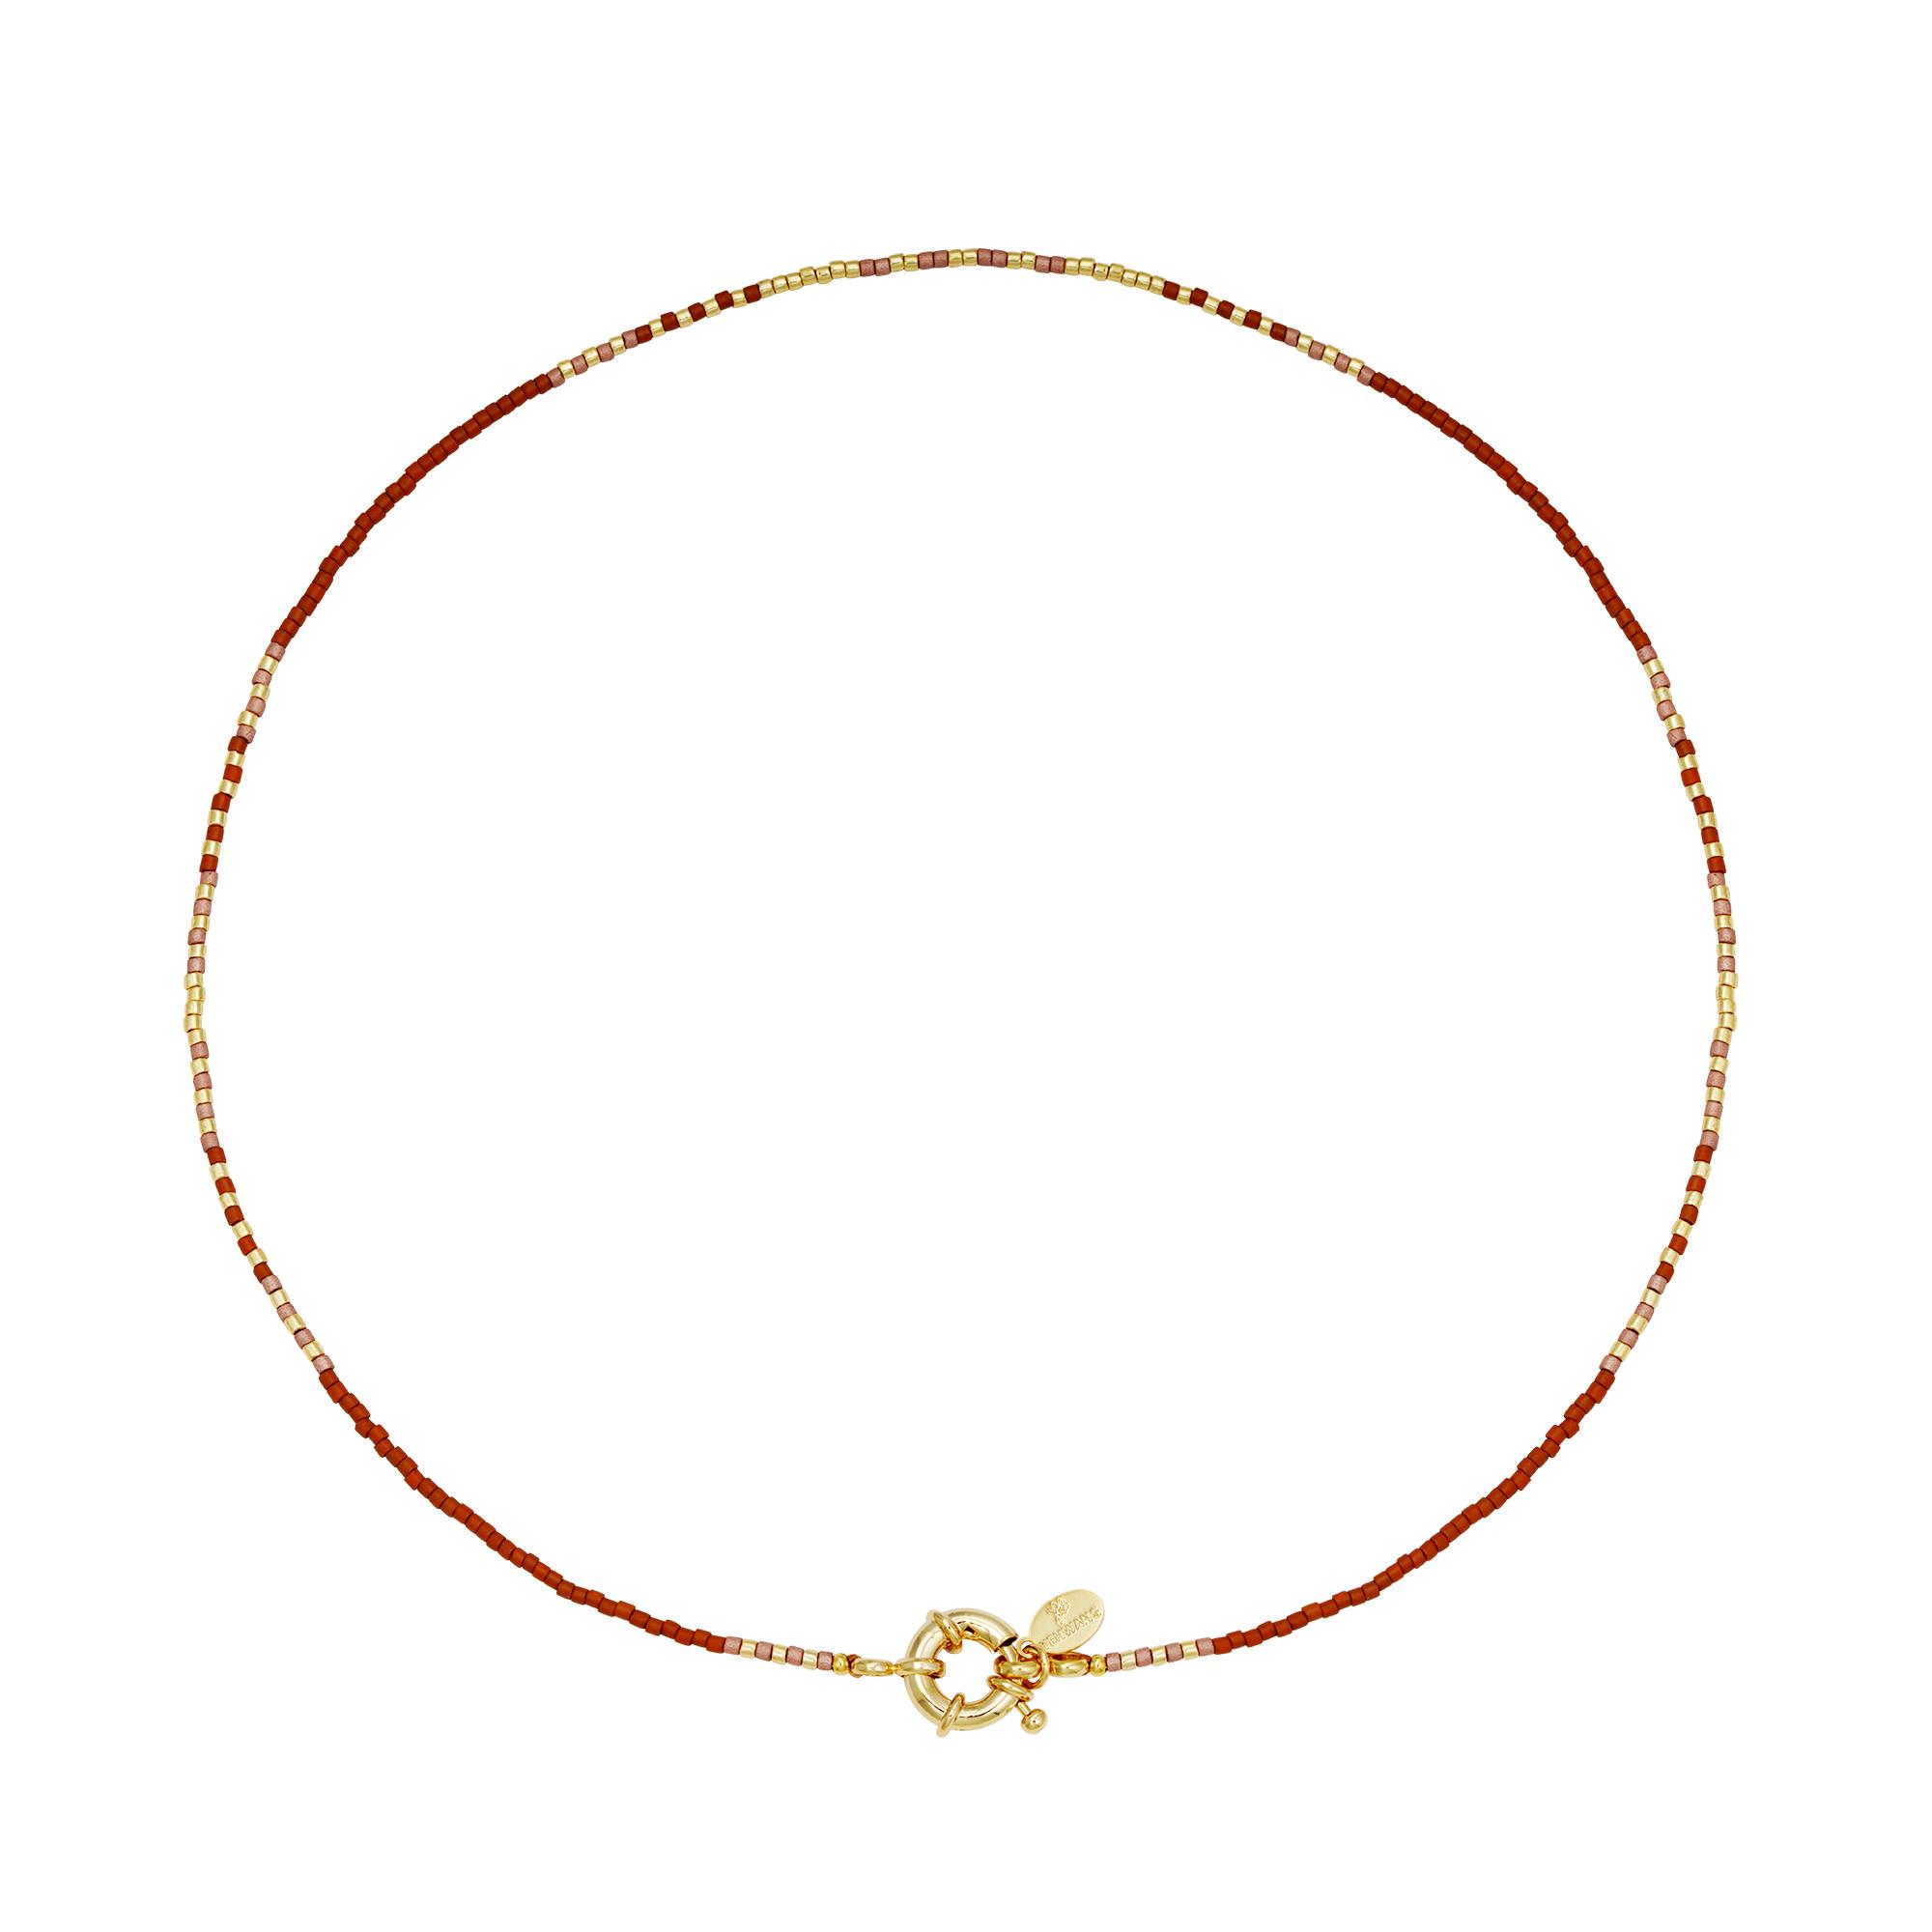 With love Necklace delicate - cognac